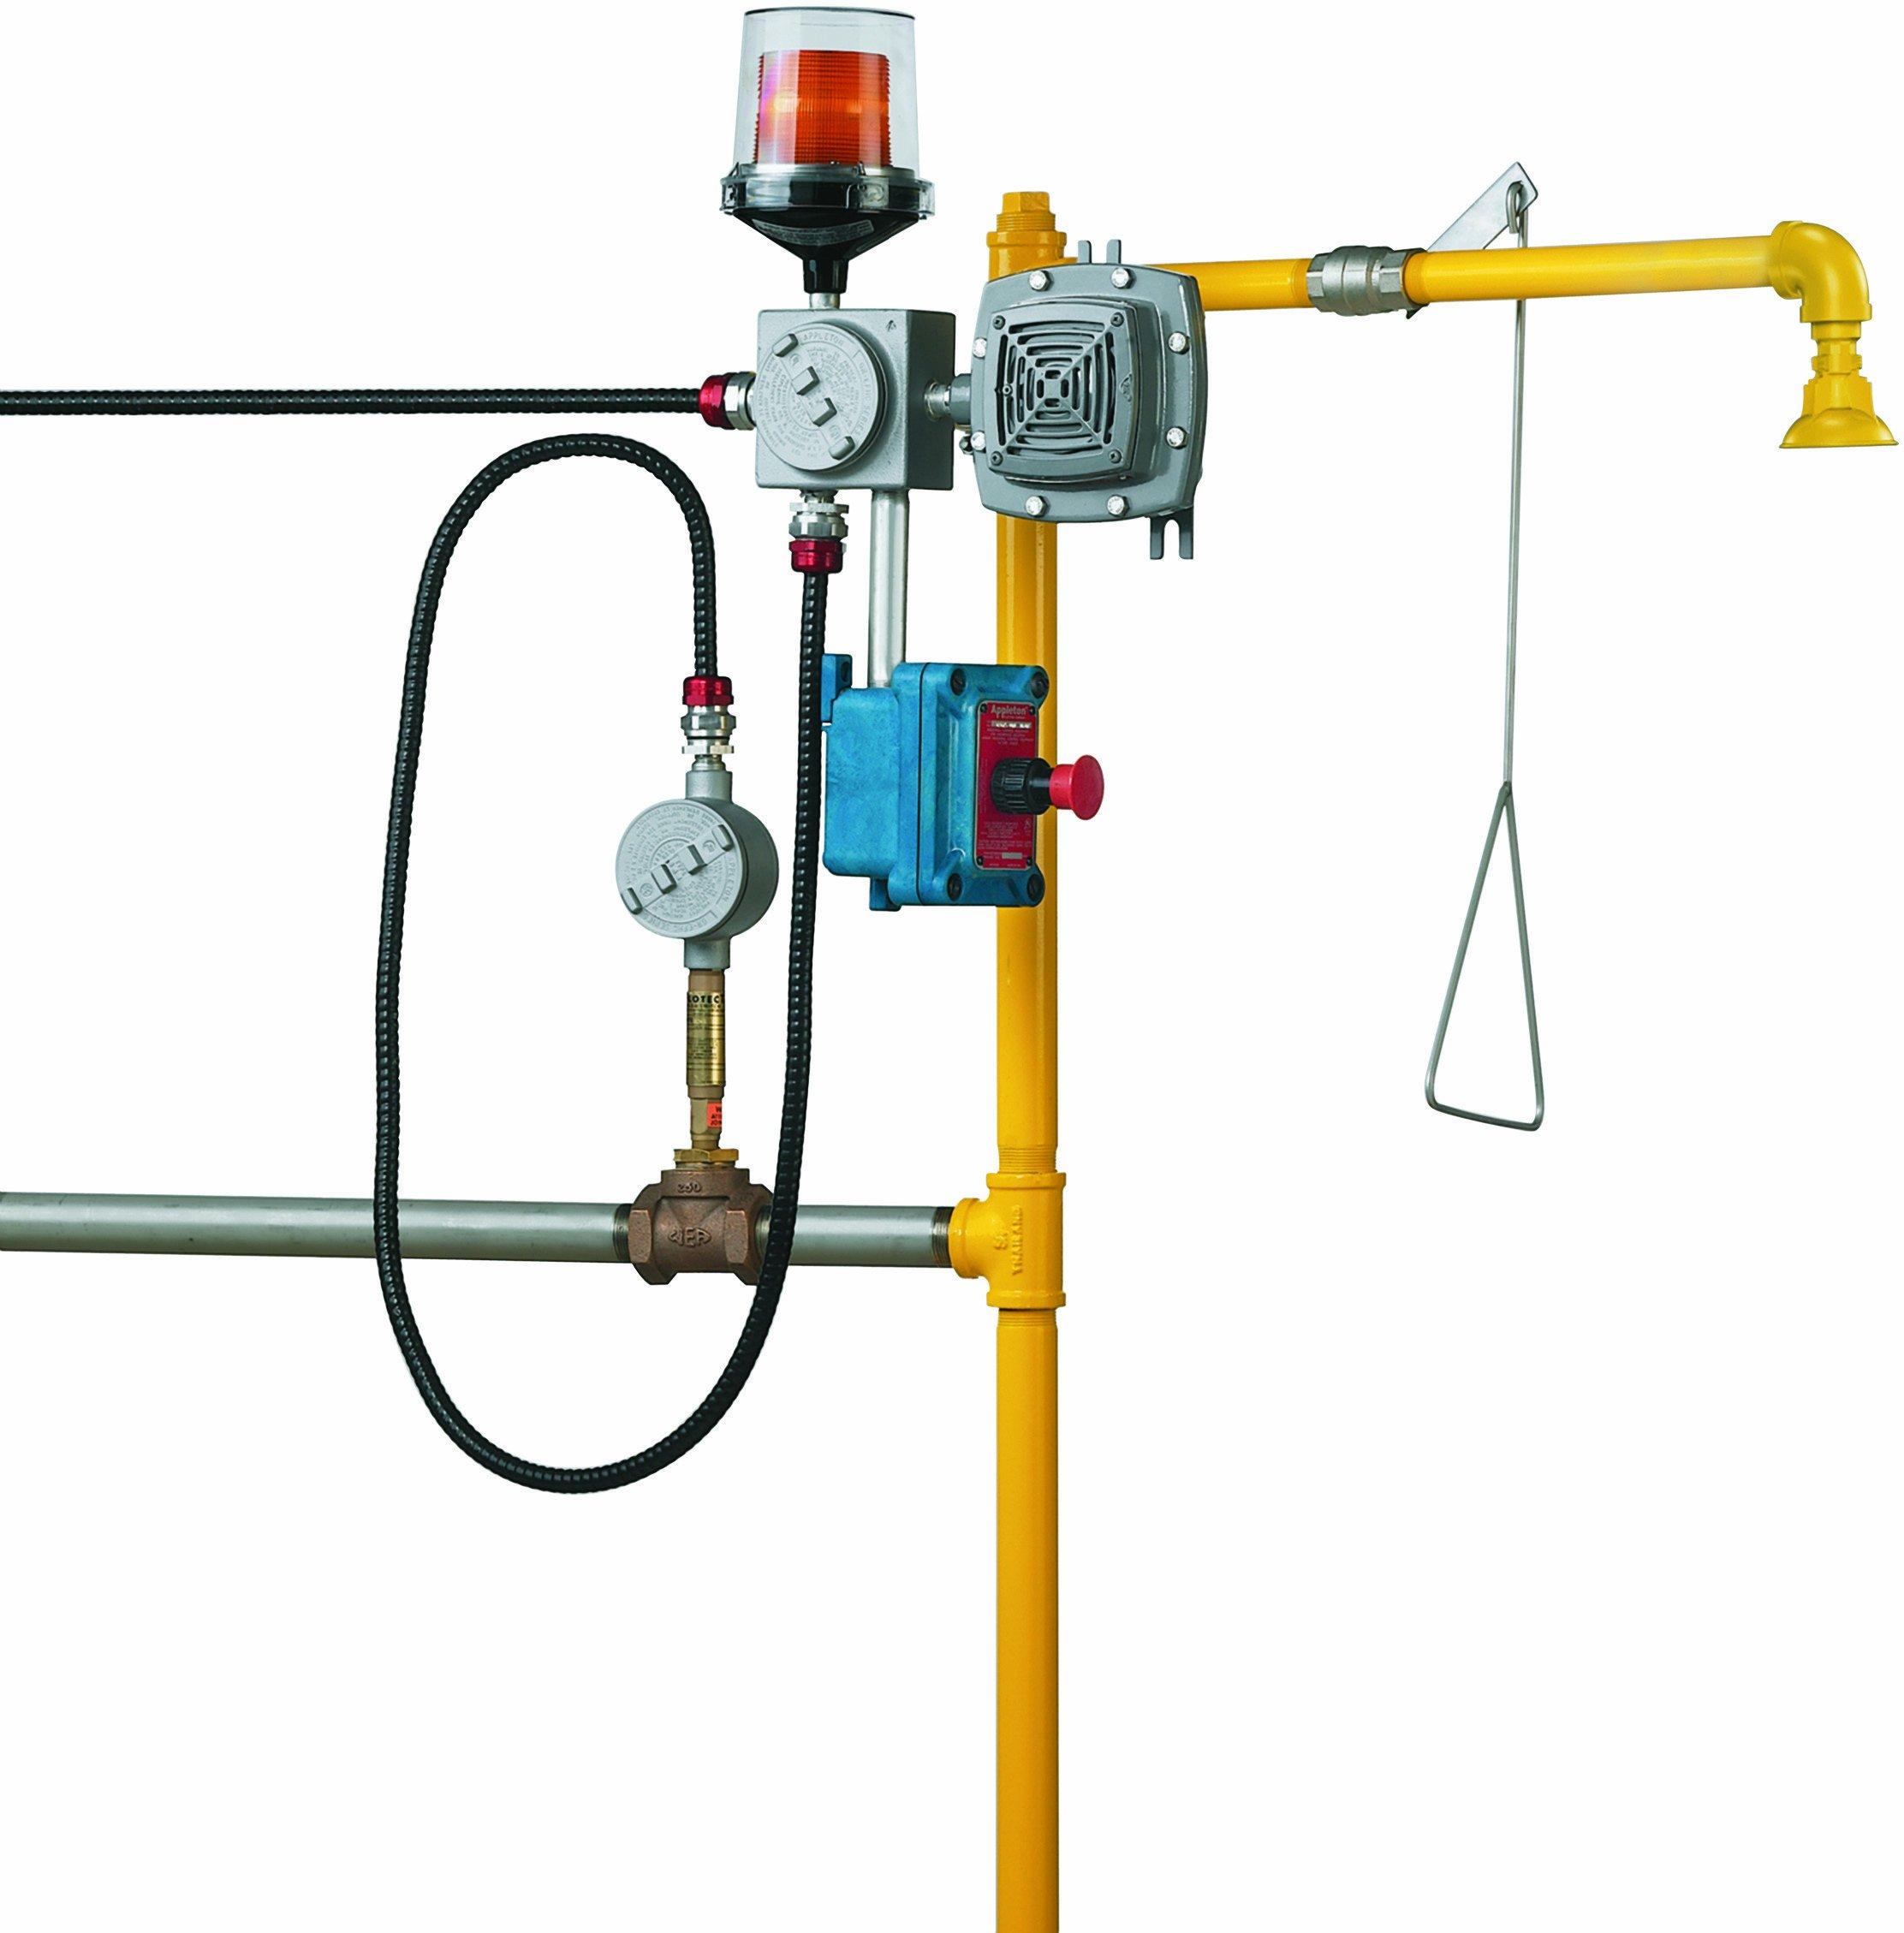 Bradley S19-320C Flow Switch Safety Shower Alarm System, 12' Cord